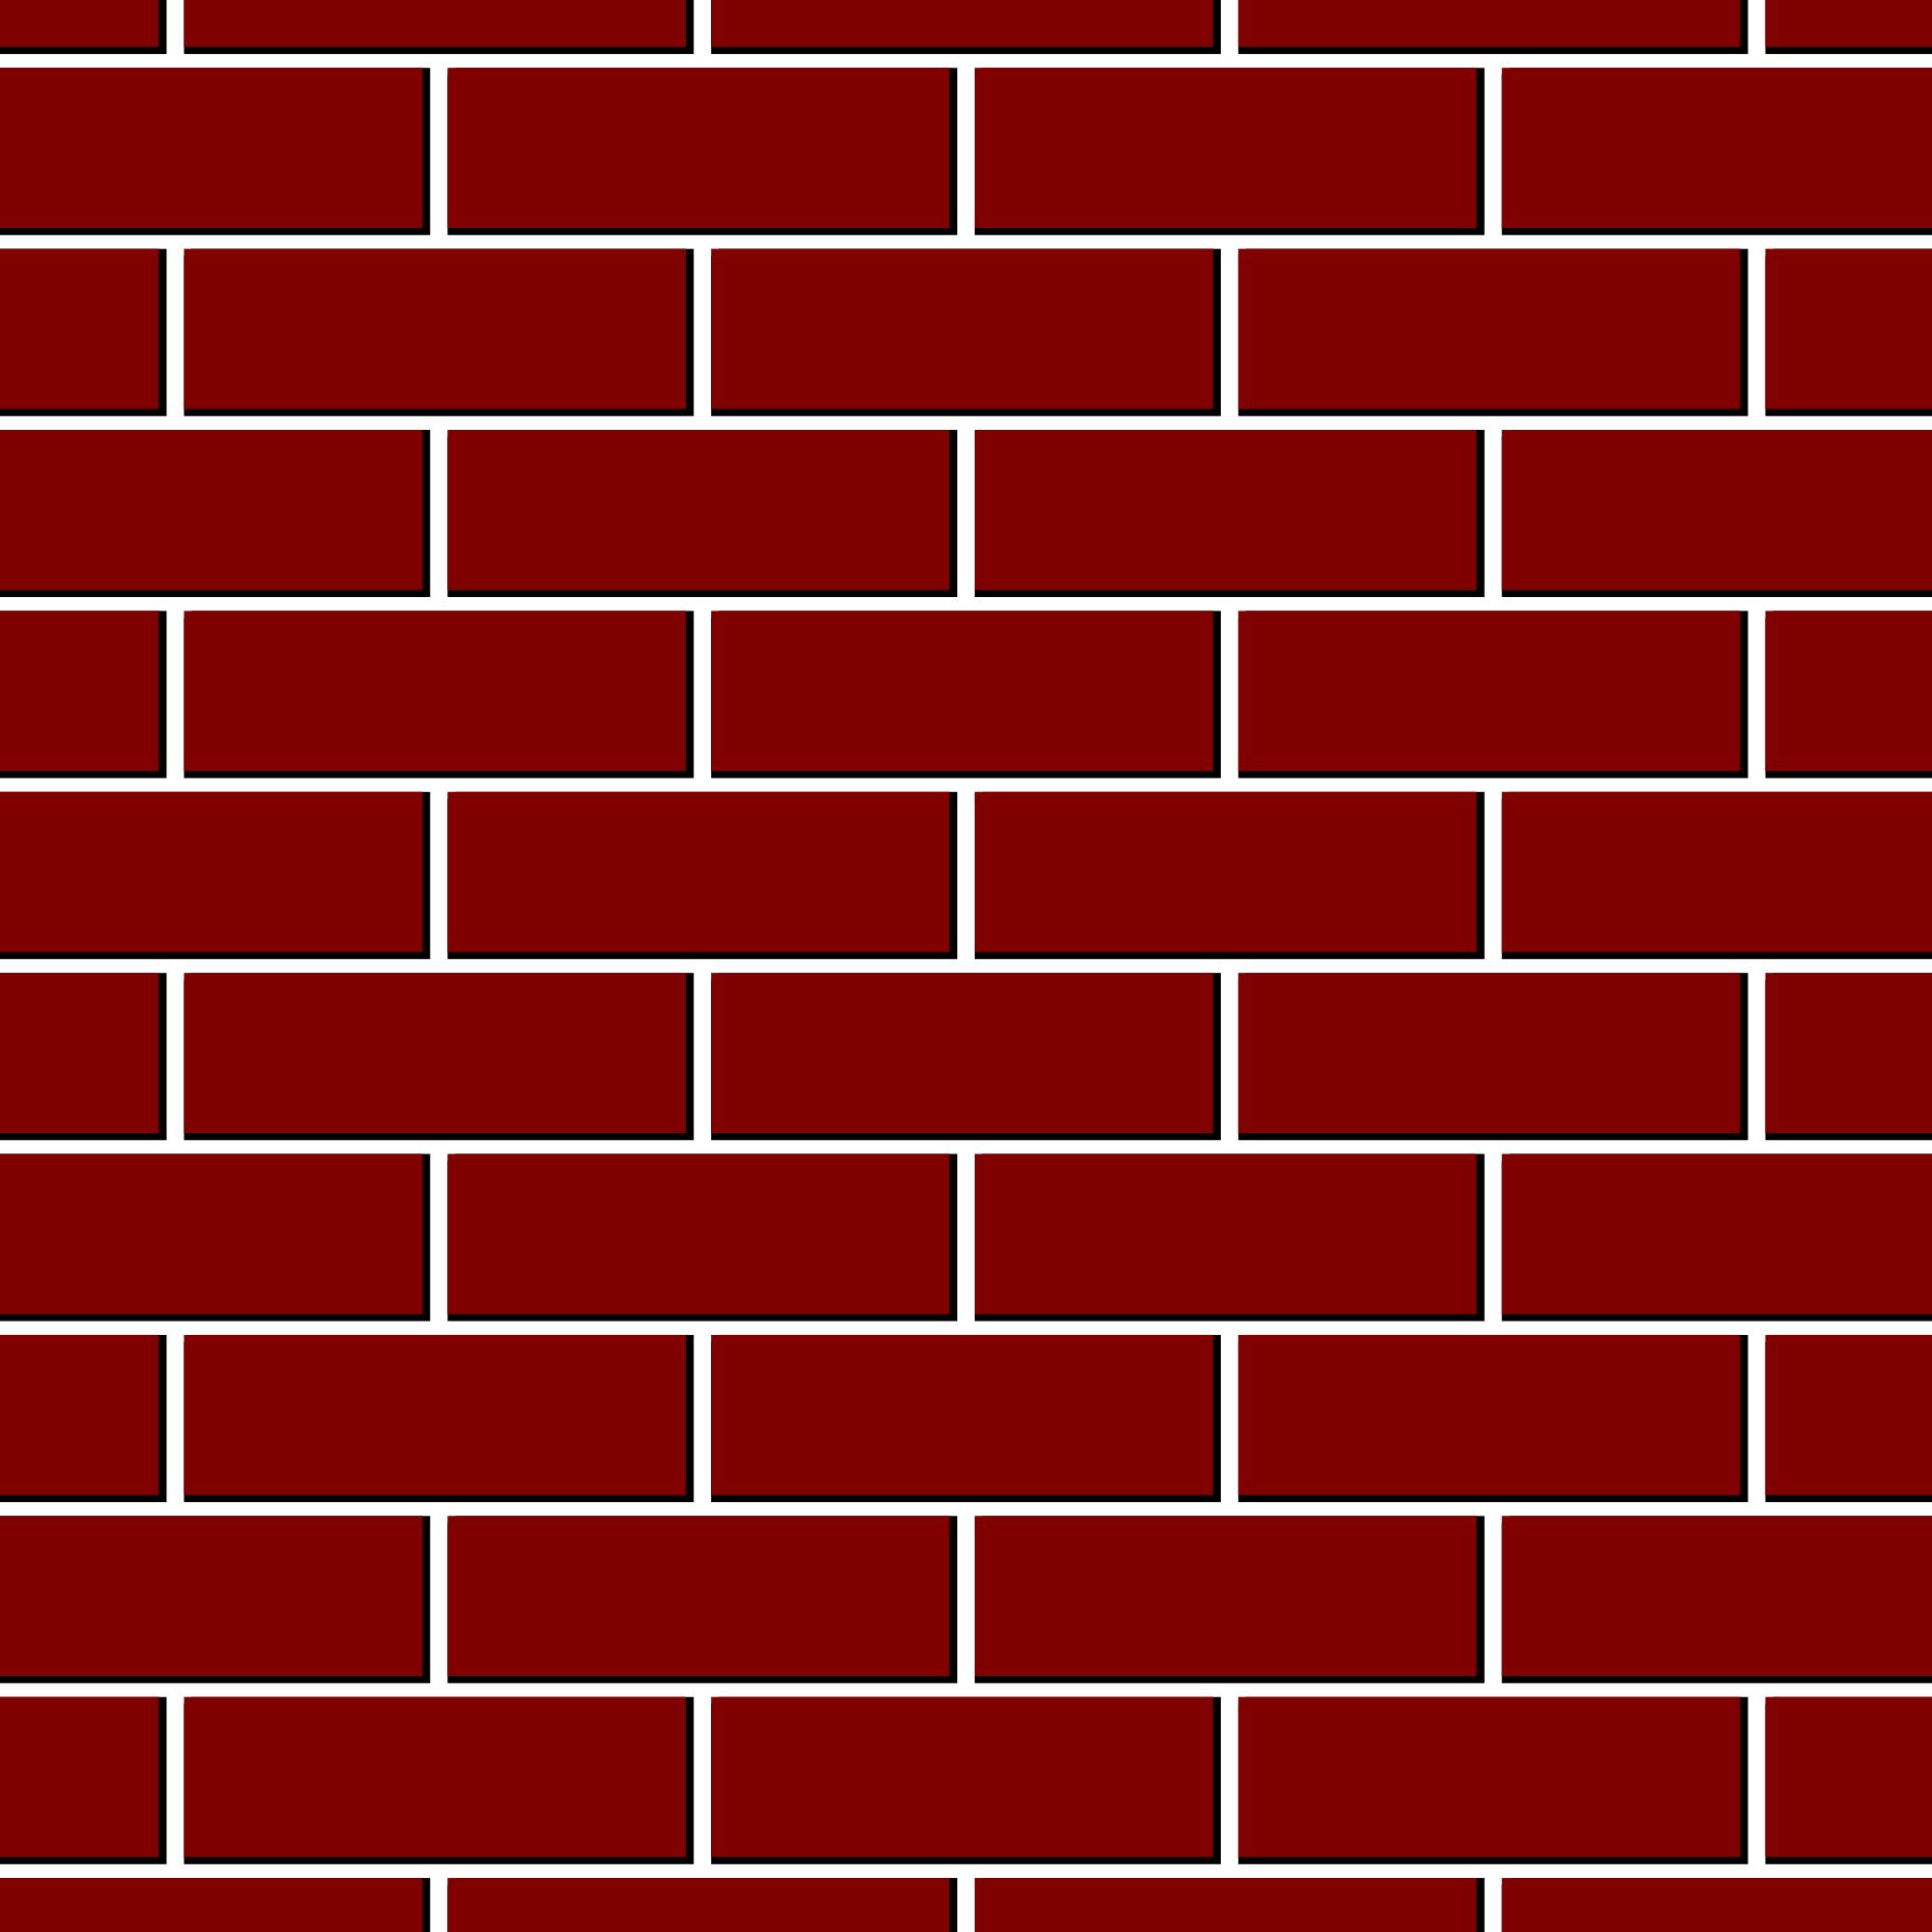 Brick svg #13, Download drawings